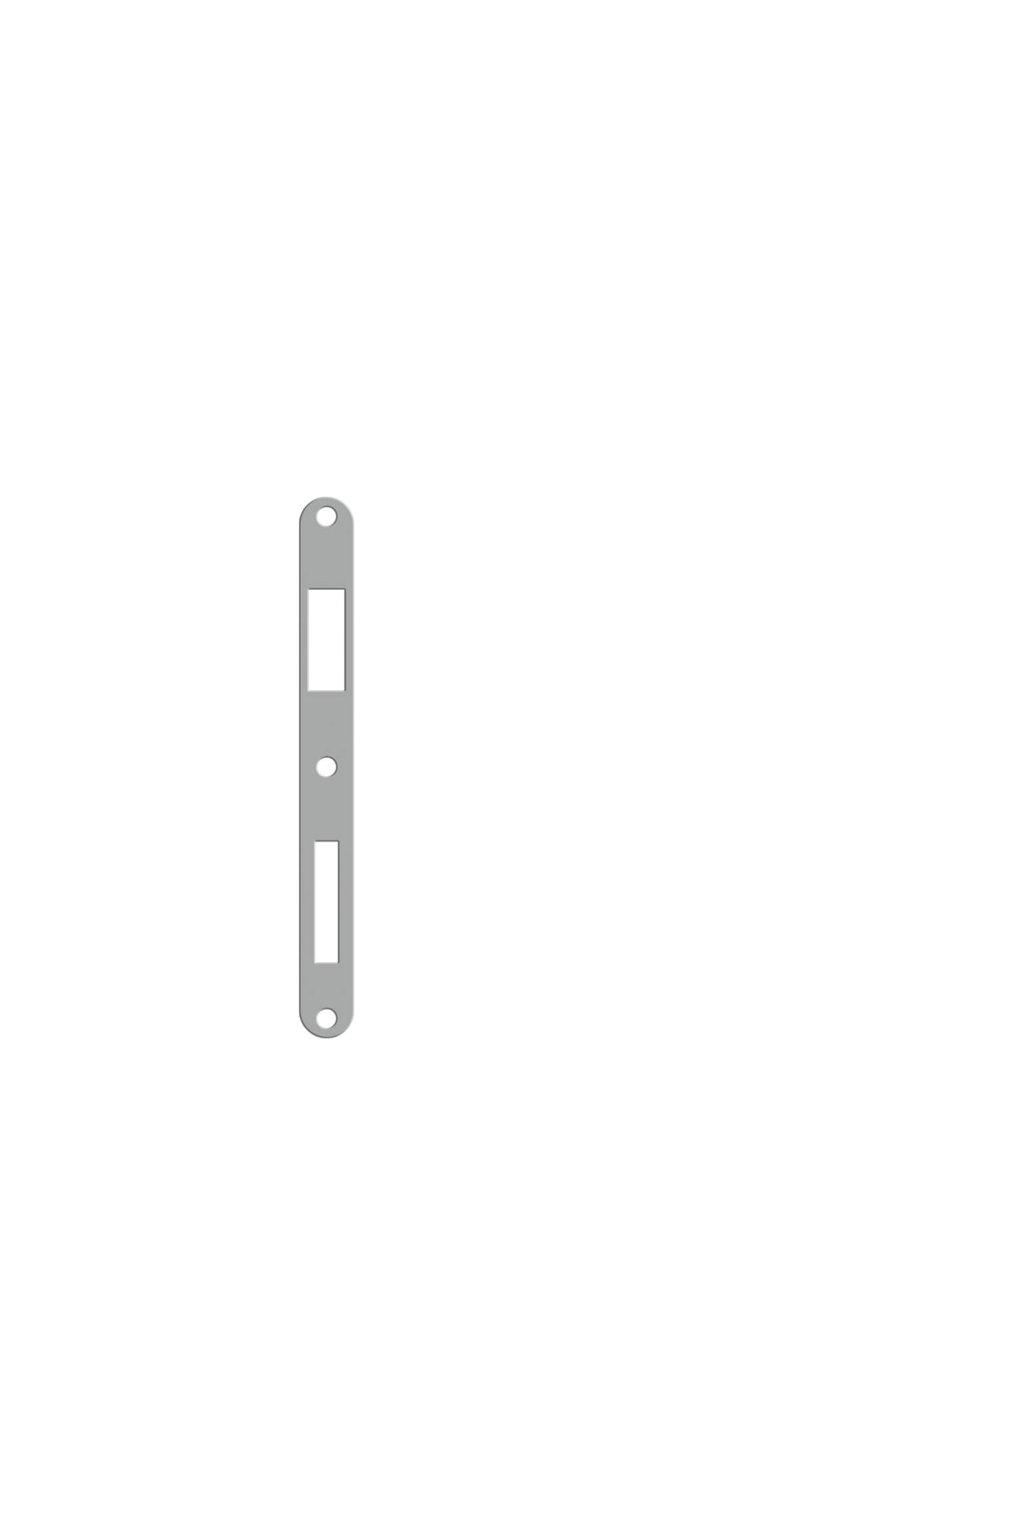 vr 035 178 protiplech (1)